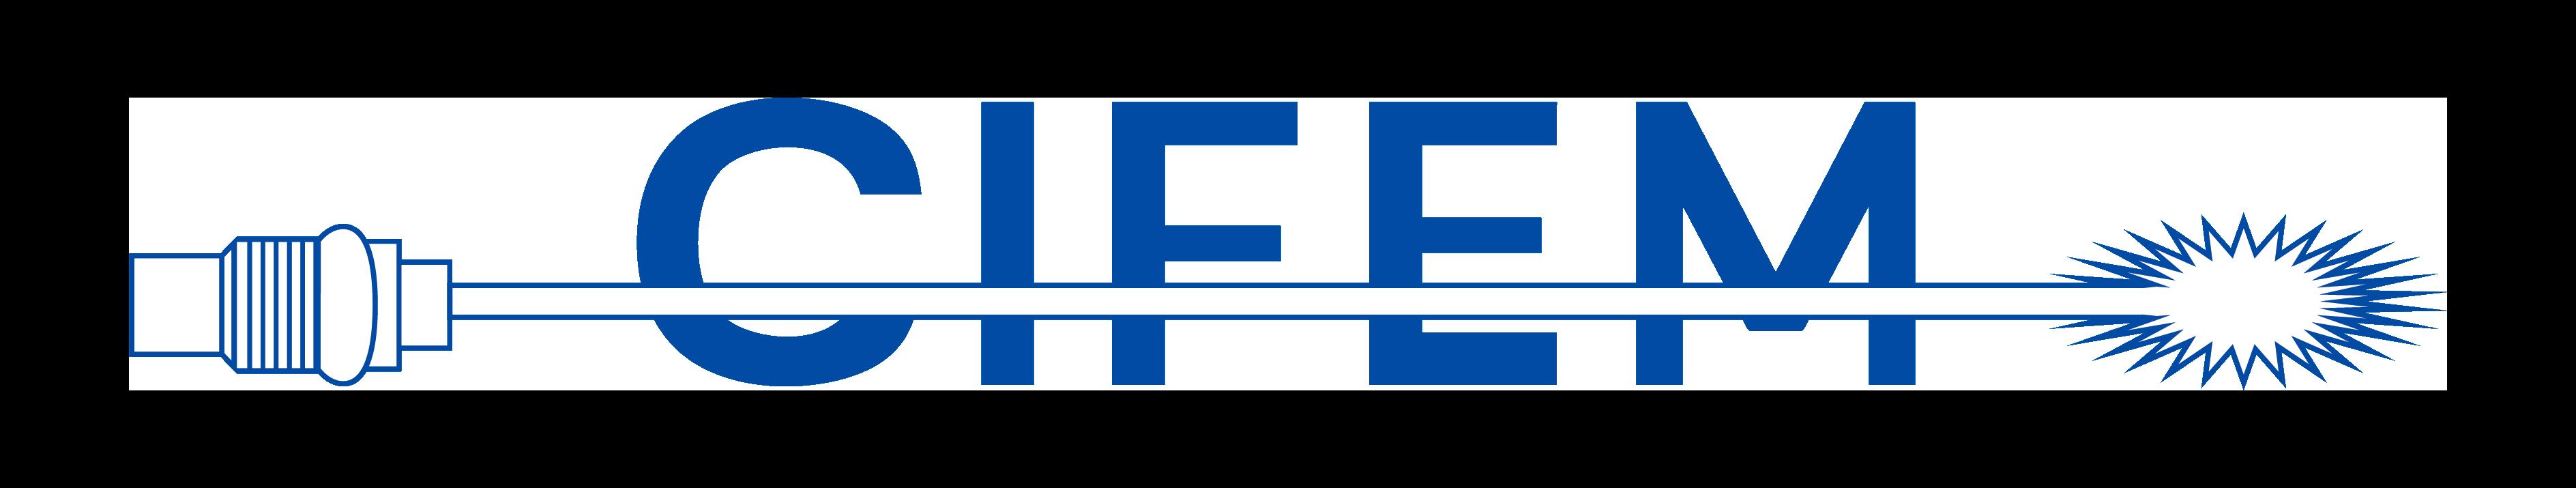 Logo de l'entreprise C.I.F.E.M